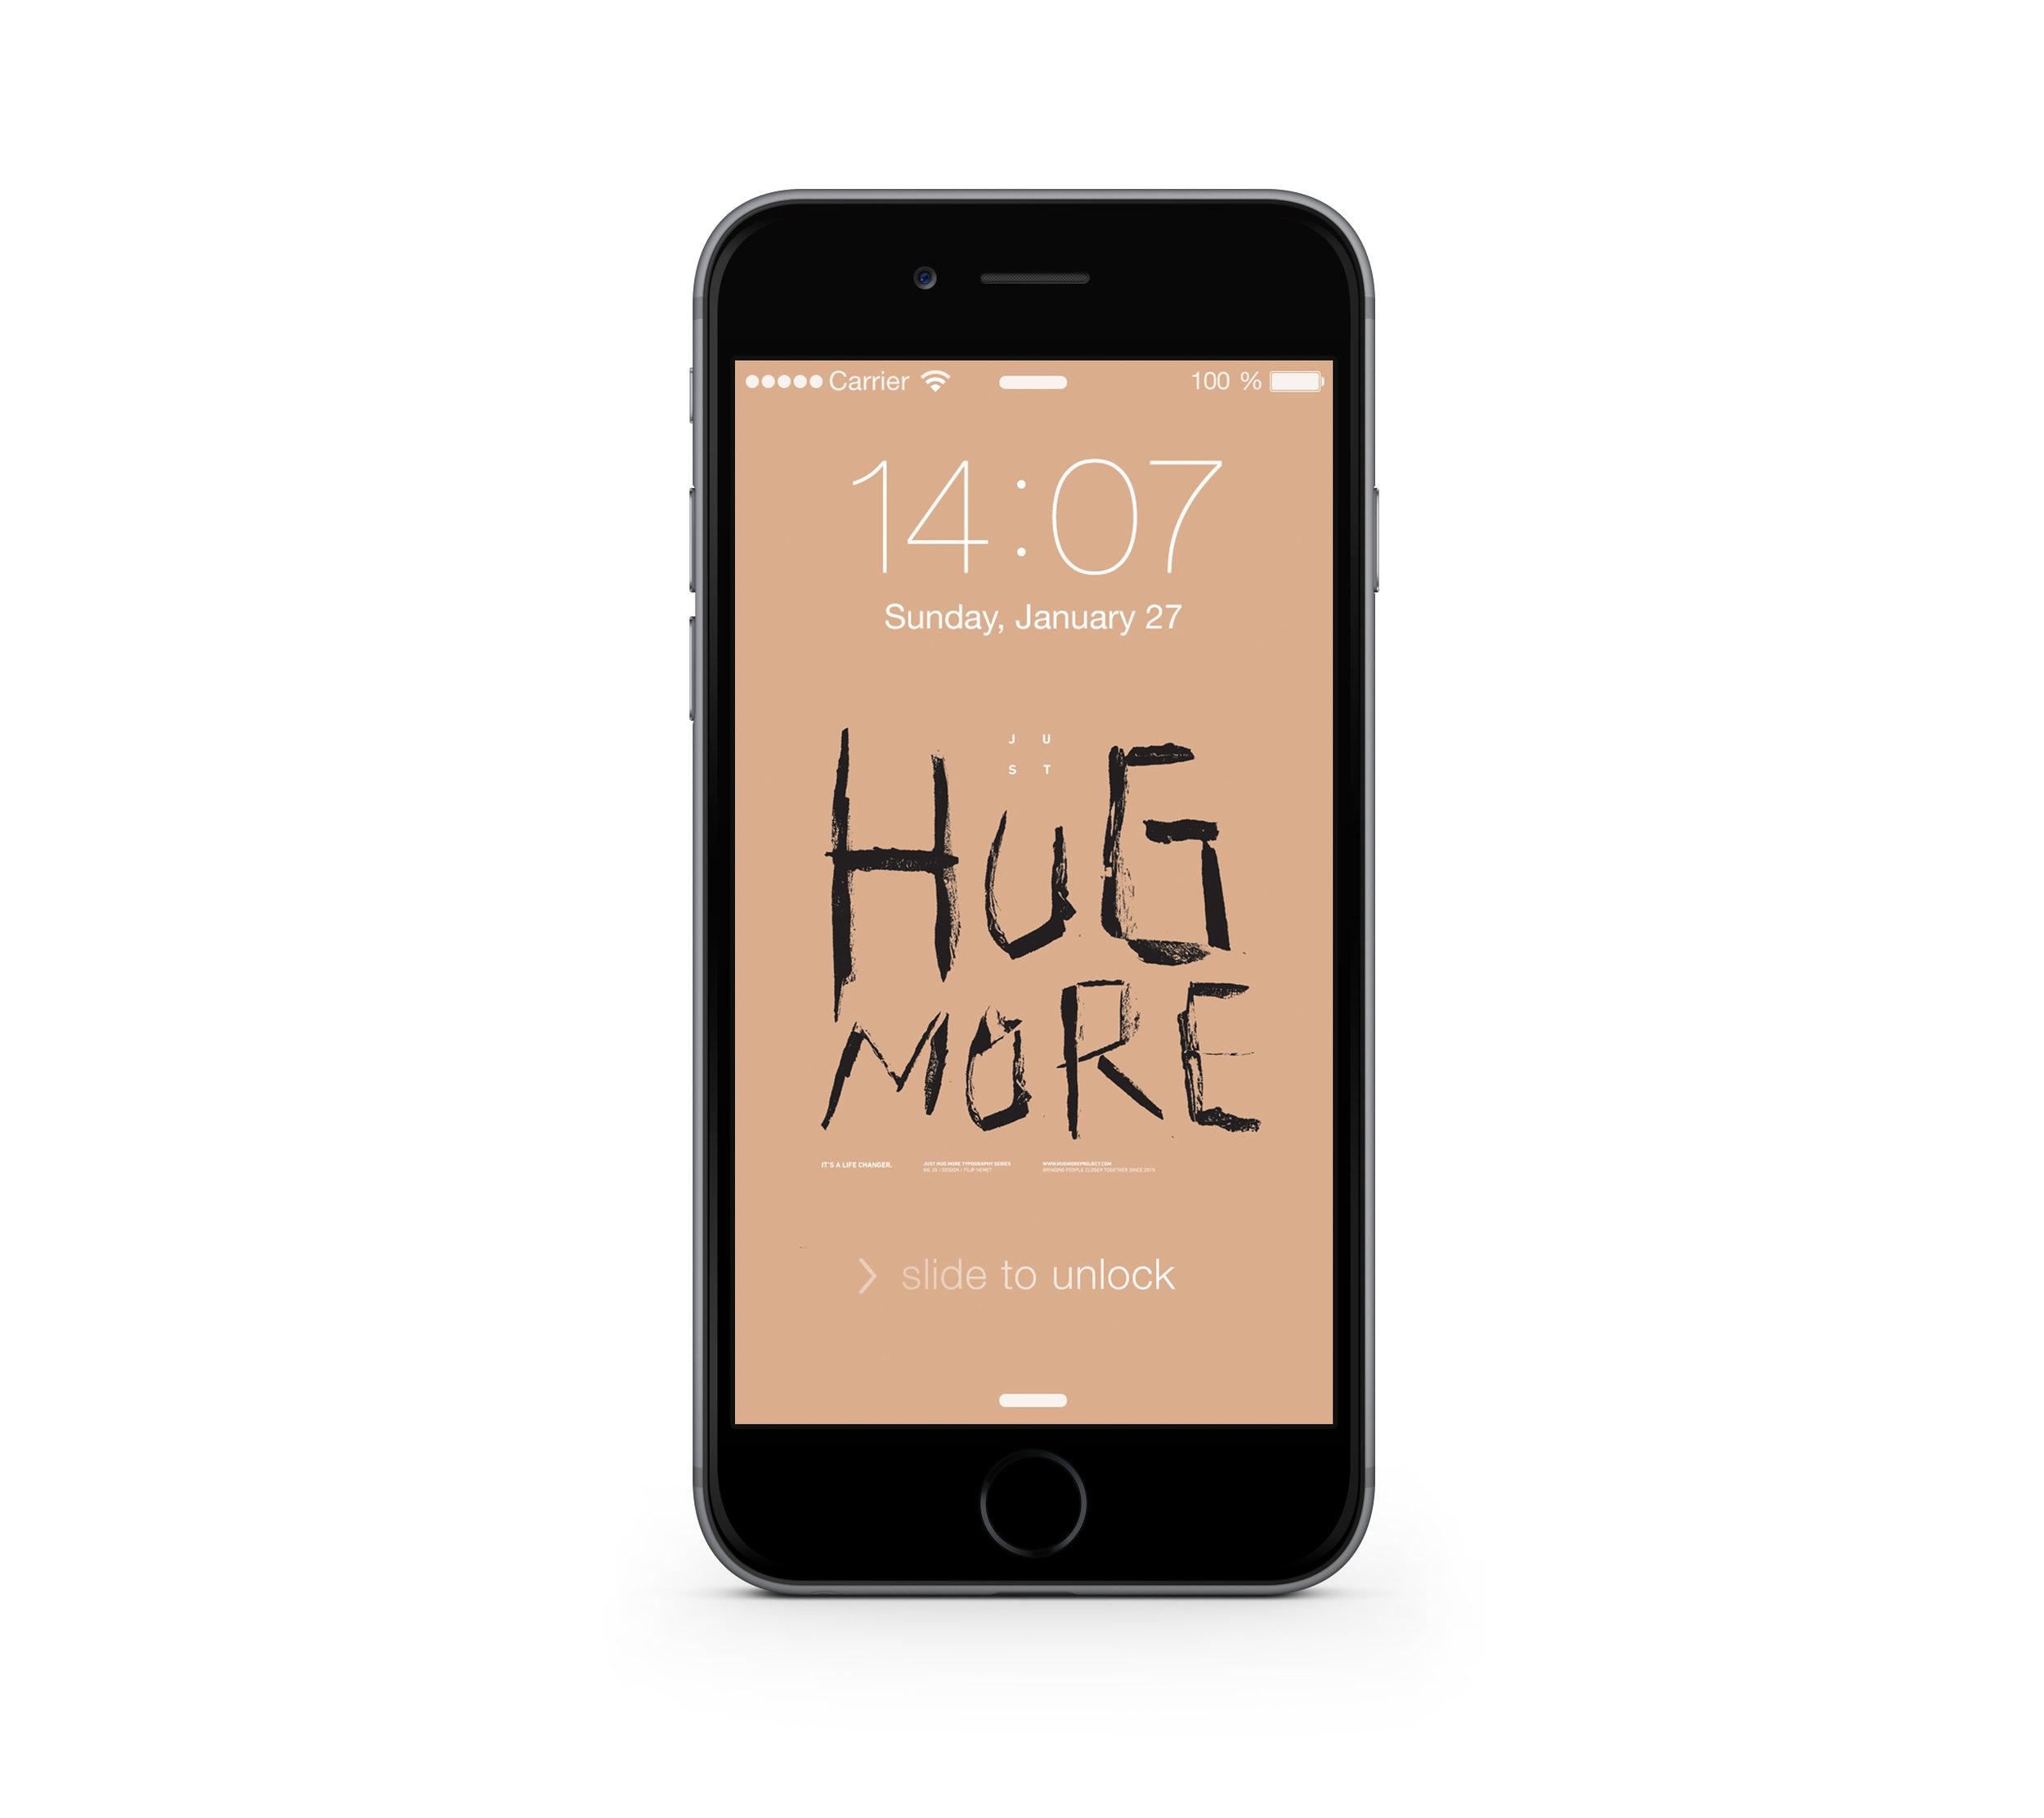 just-hug-more-typo-035-iPhone-mockup-onwhite.jpg